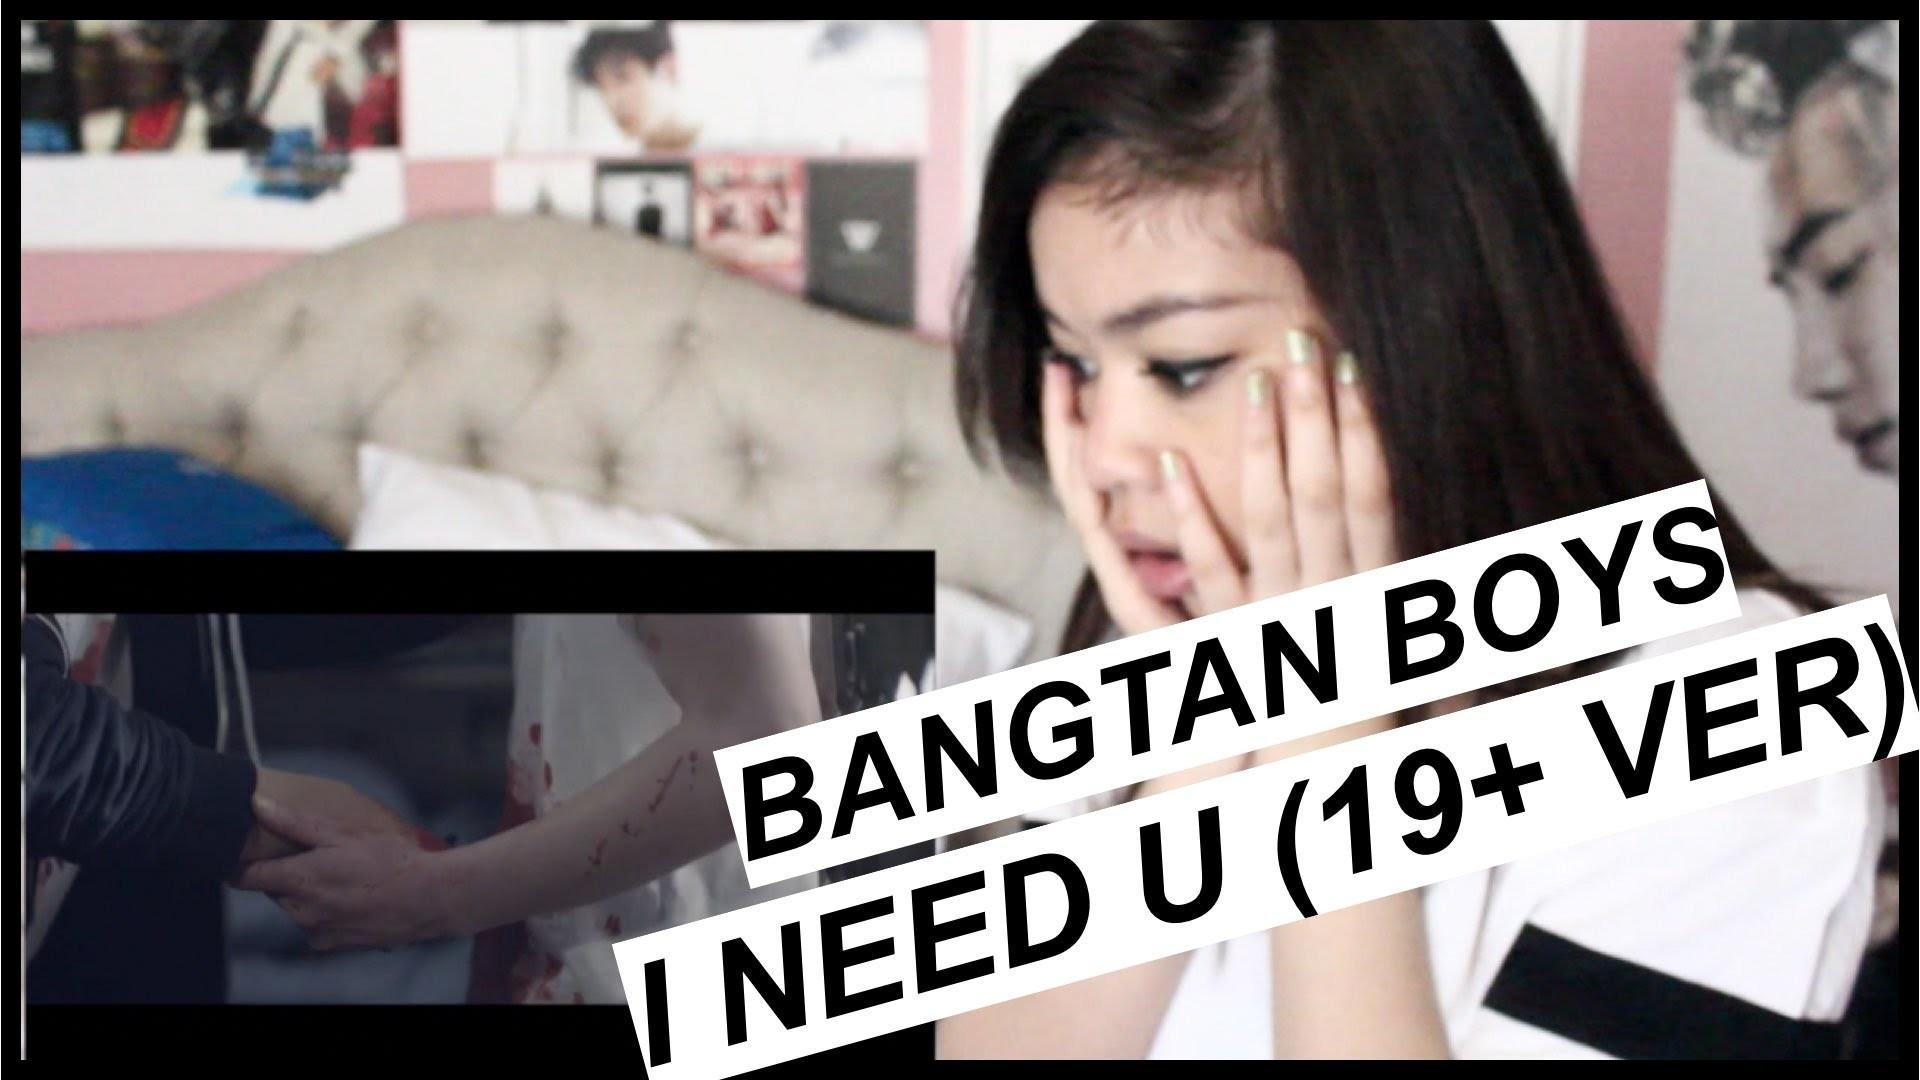 BANGTAN BOYS I NEED U (19+ VERSION) MV REACTION | PARADISELOVEX – YouTube